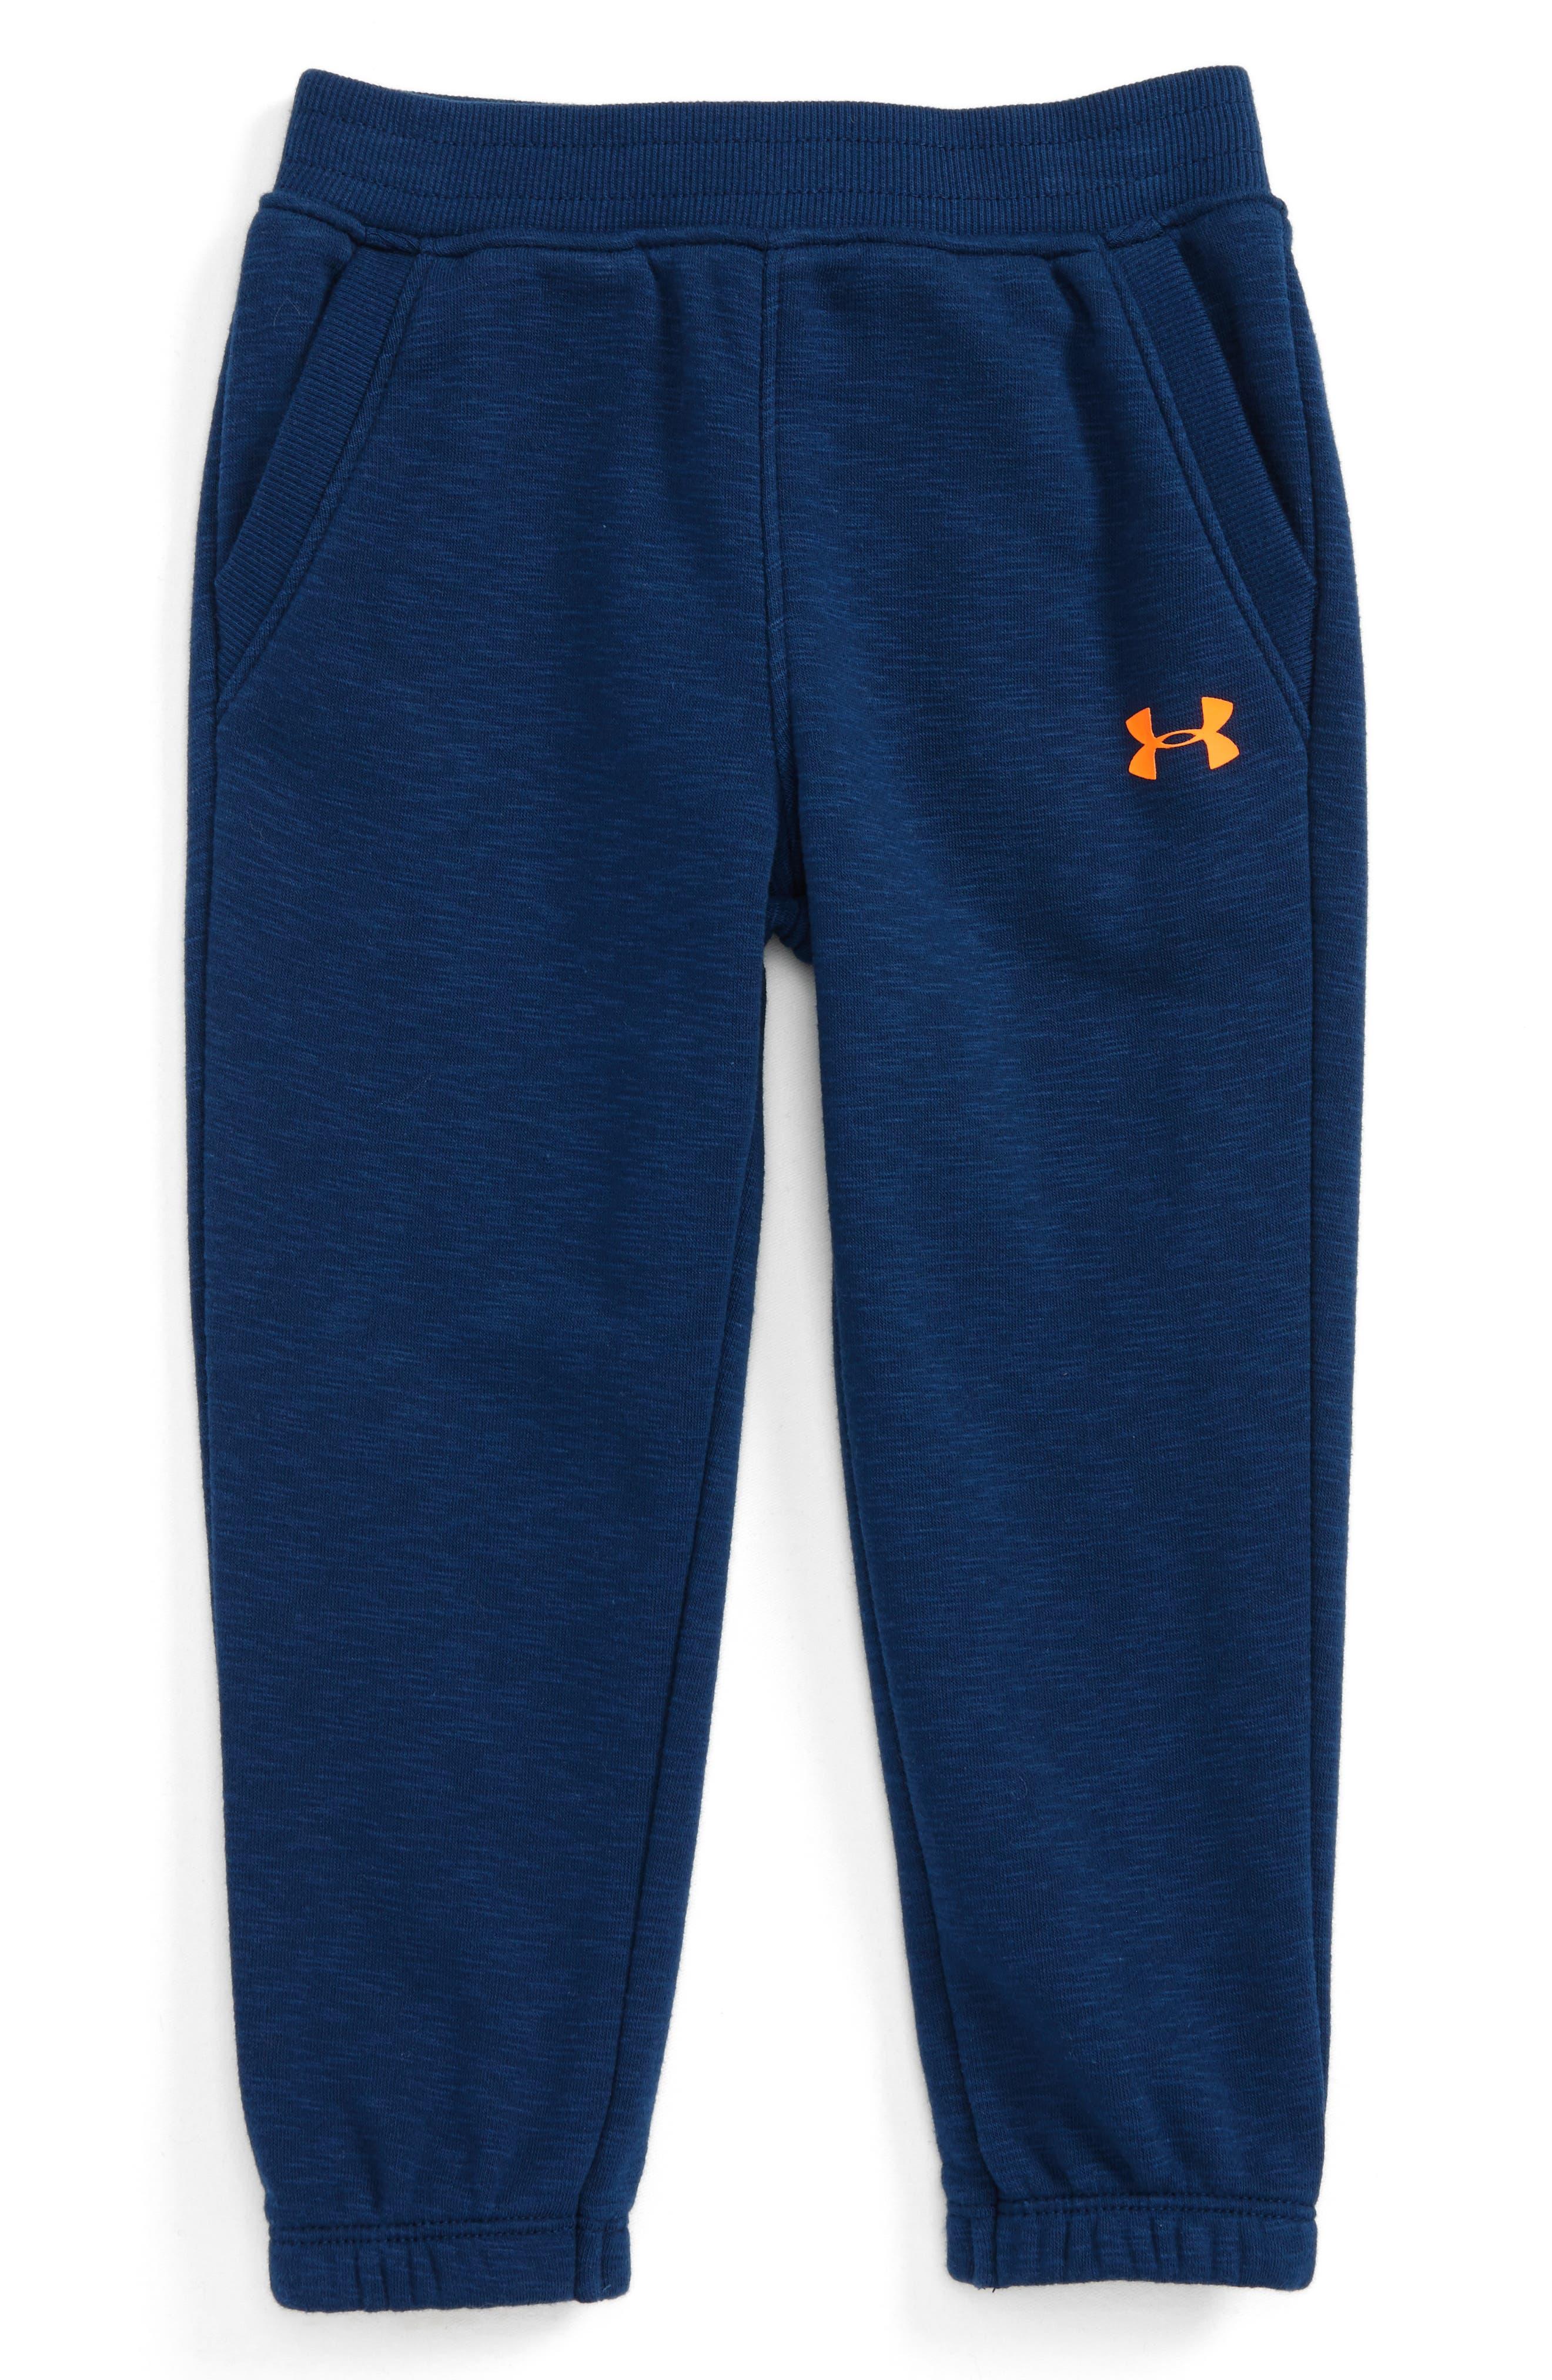 Under Armour Sportstyle ISO Jogger Pants (Toddler Boys & Little Boys)